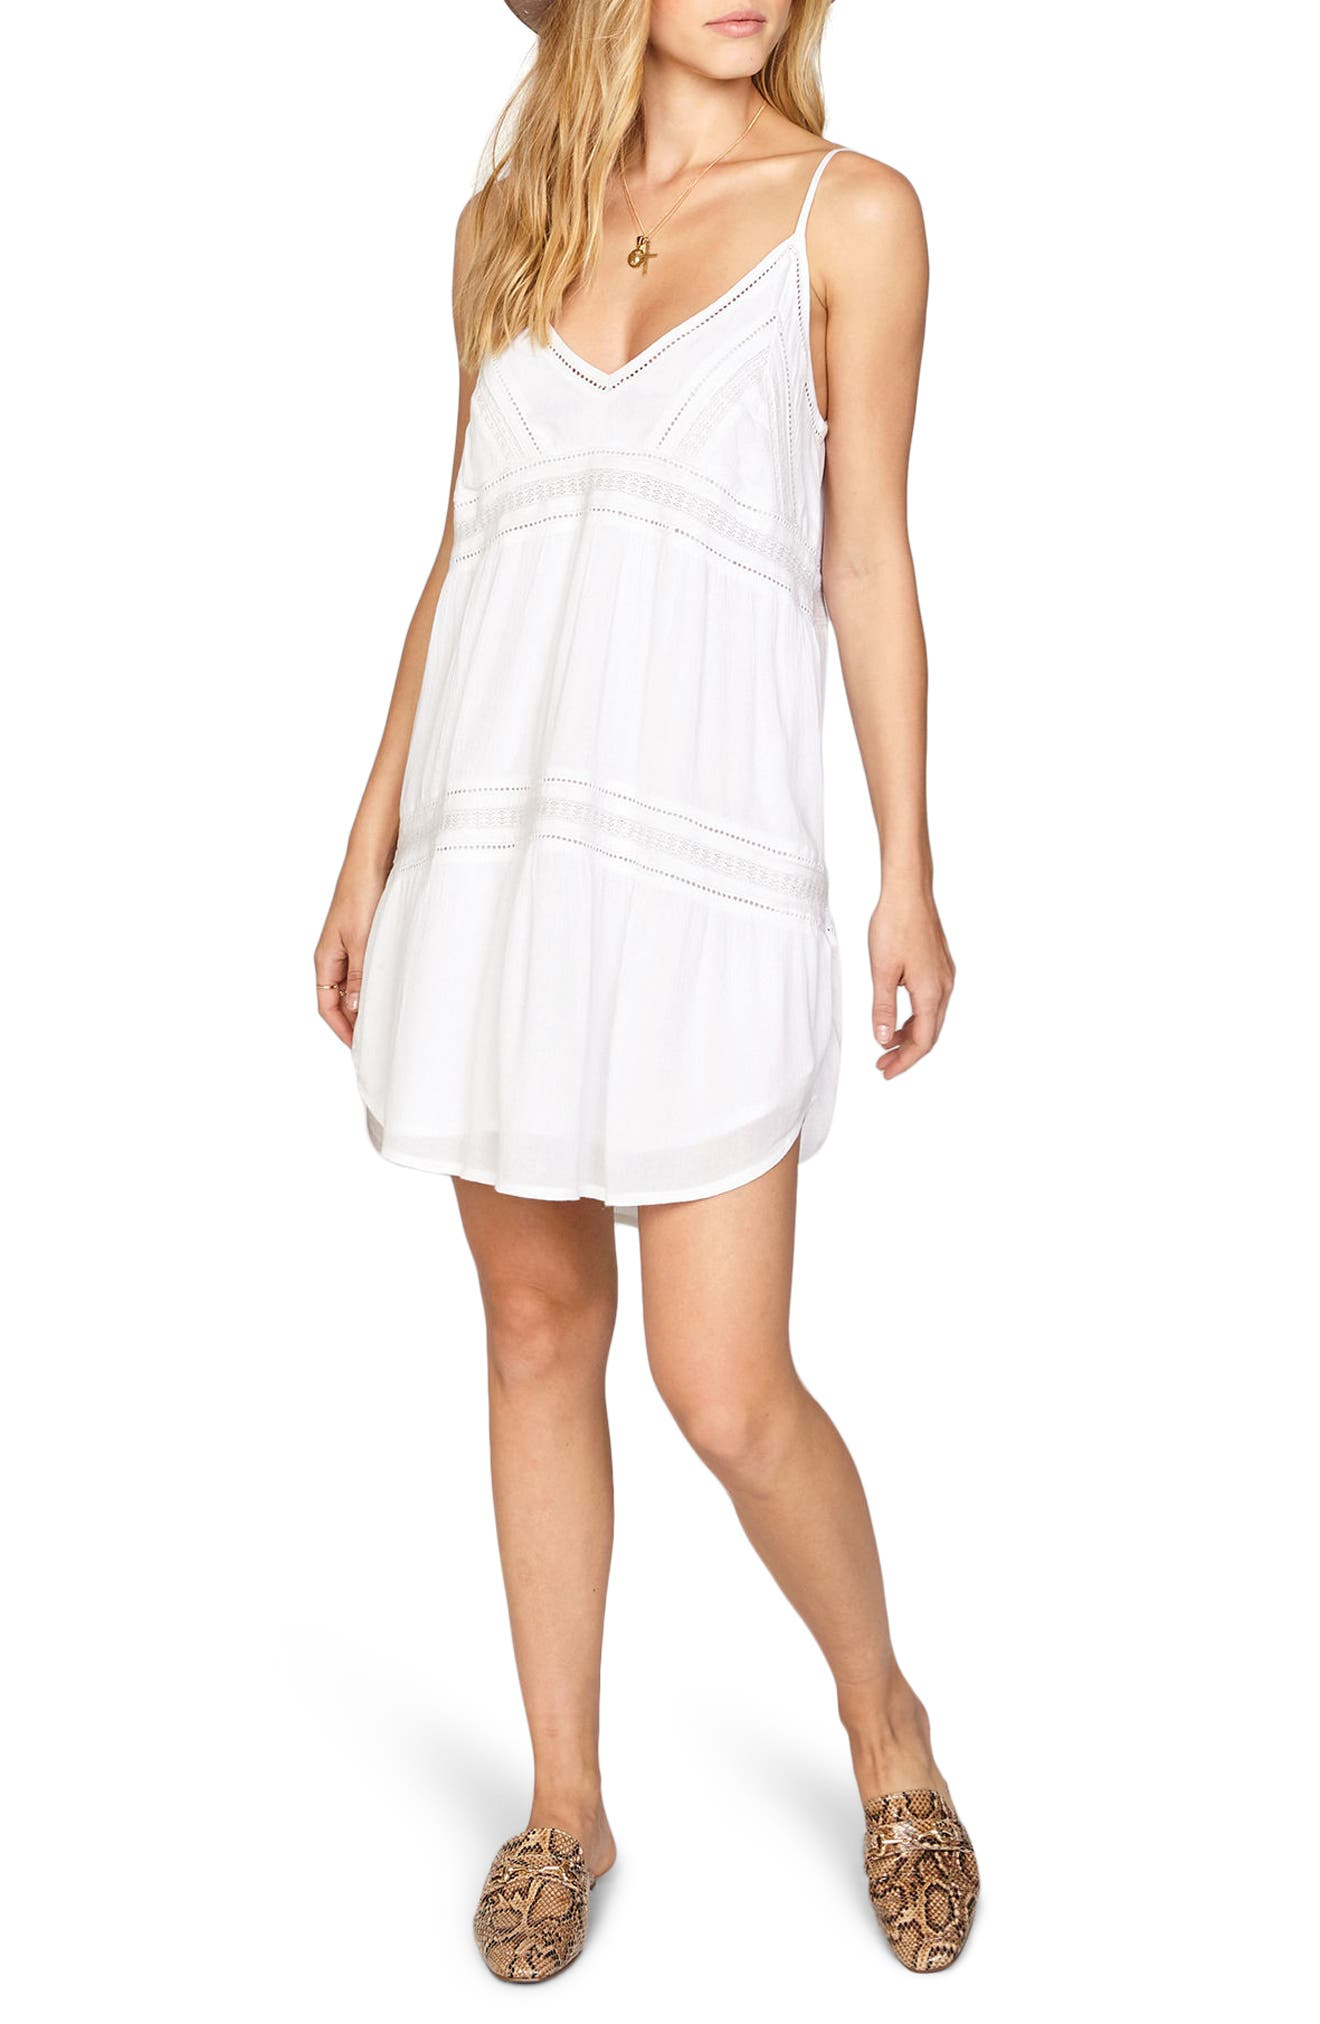 Alternate Image 1 Selected - Amuse Society Summer Light Dress